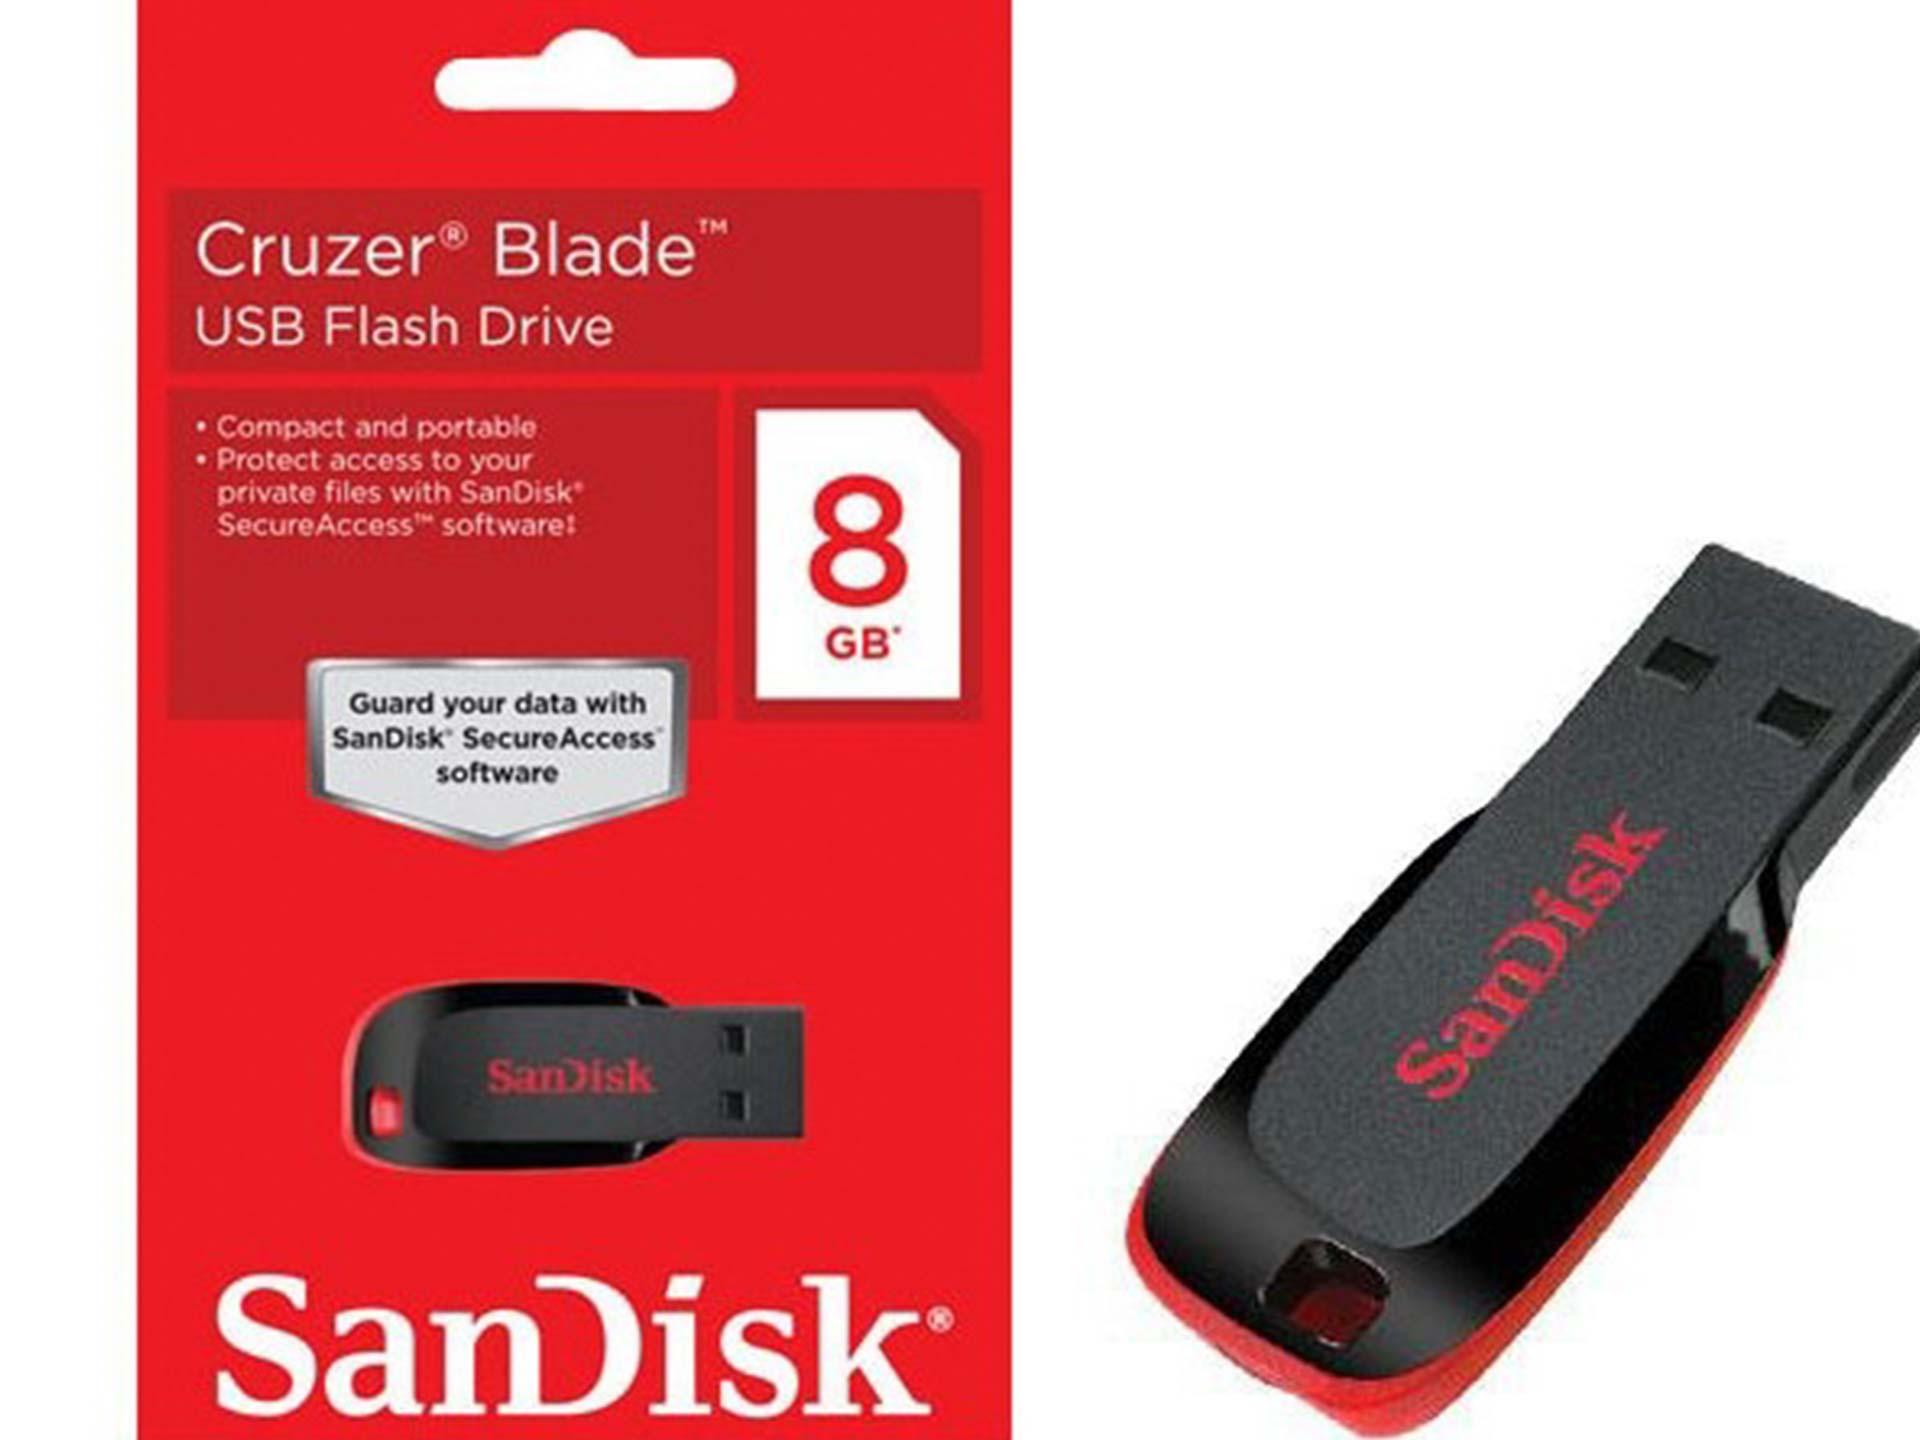 sandisk cruzer blade drivers windows 7